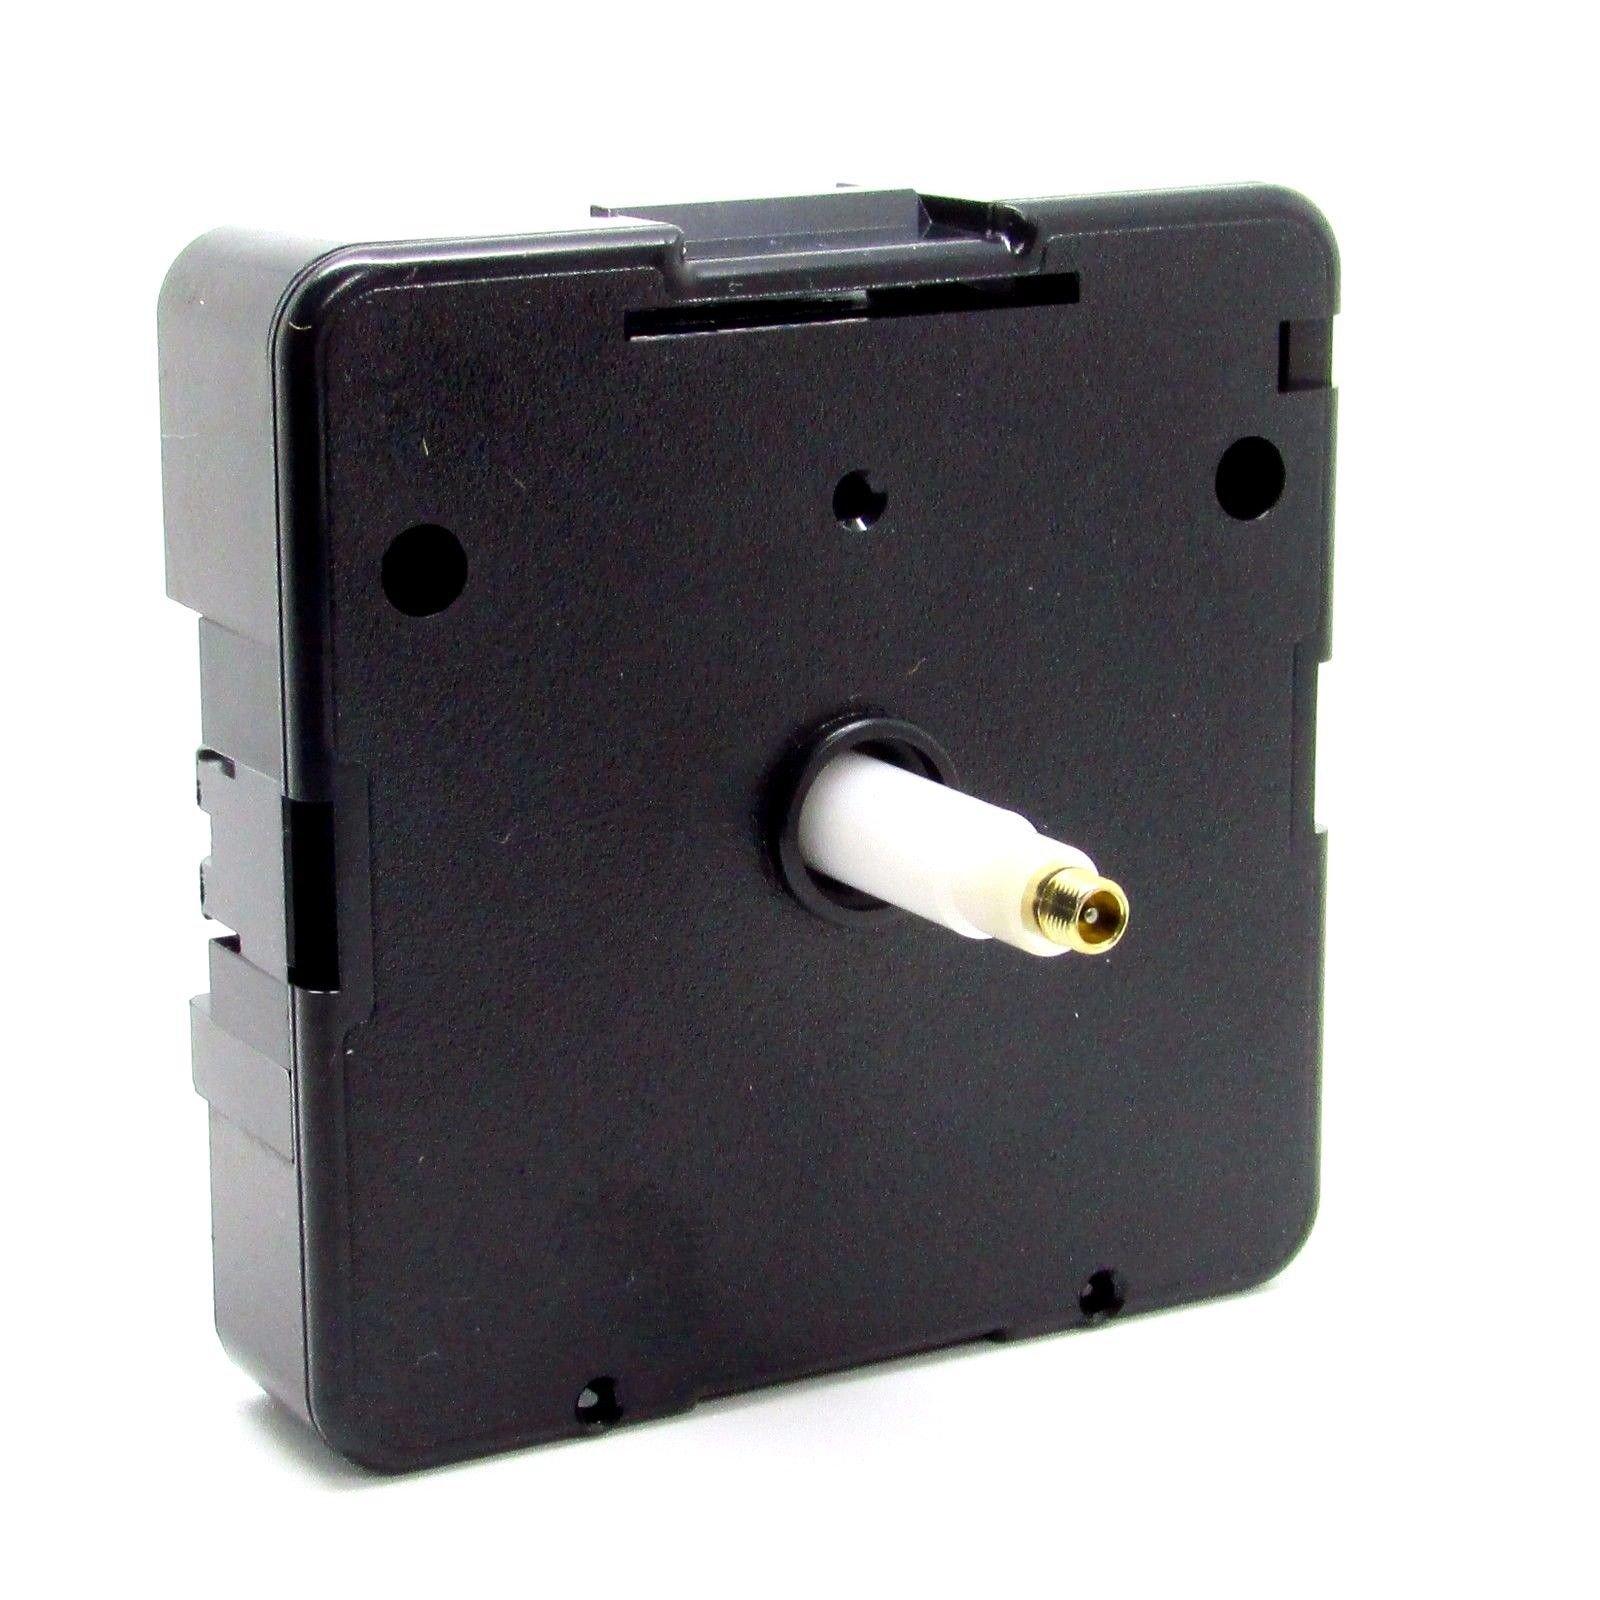 New Replacement UTS Quartz German Euroshaft Movement Mechanism Motor (20mm Shaft - Clock Faces 8-12mm Thick)